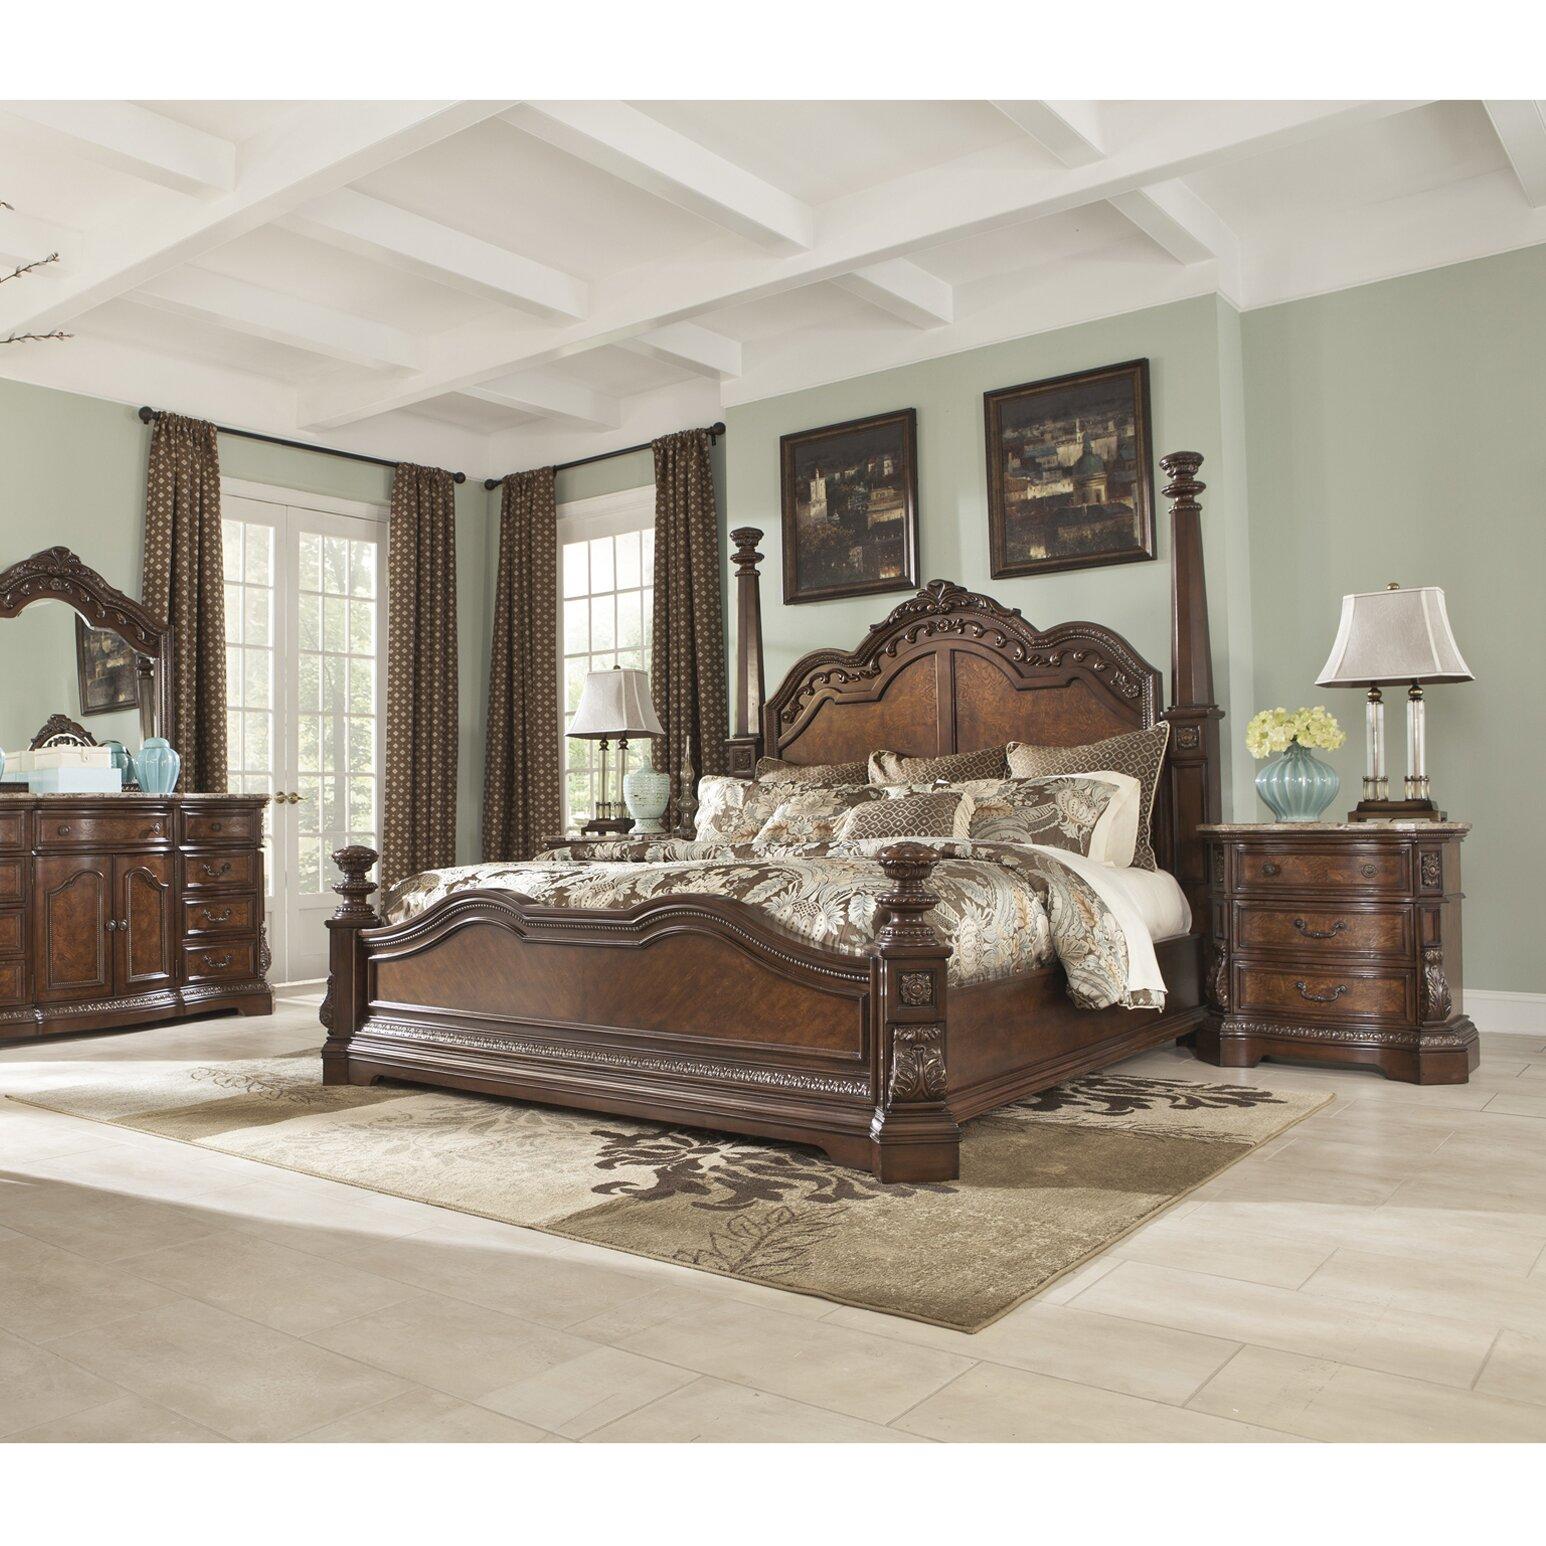 Signature design by ashley ledelle panel customizable - Ashley bedroom furniture reviews ...